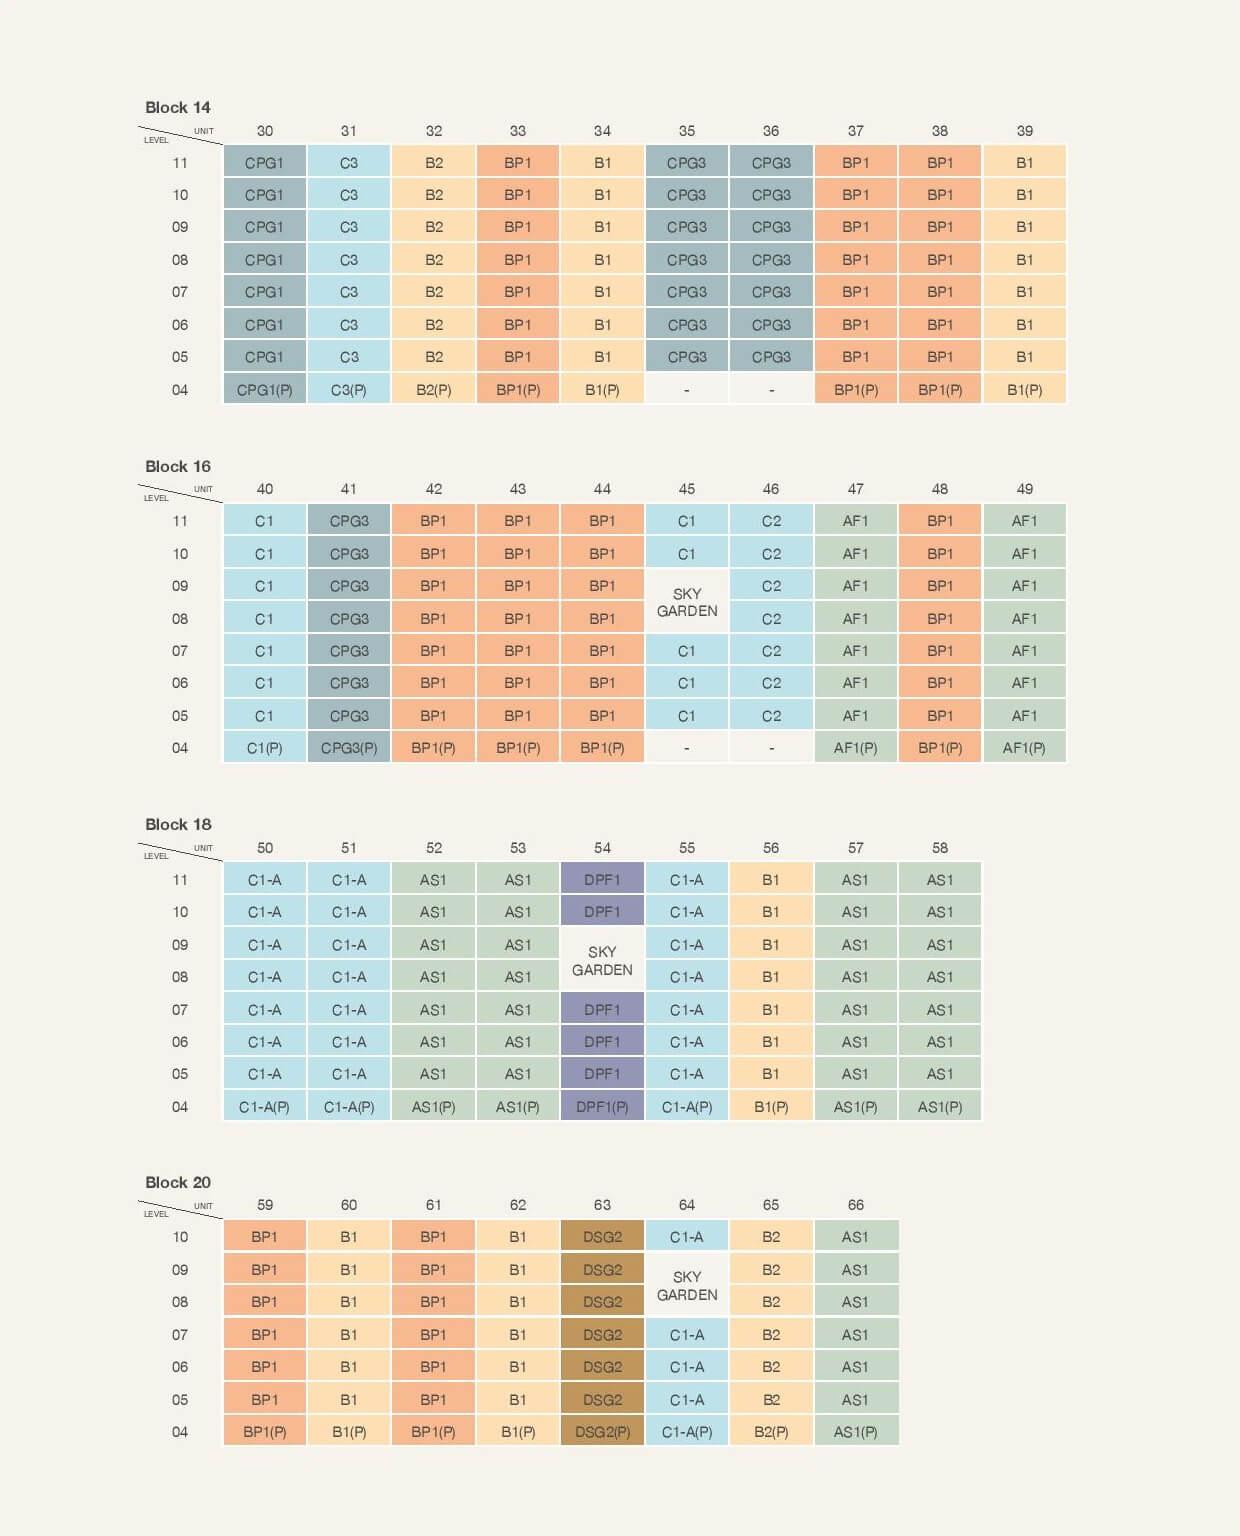 Pasir Ris 8 Elevation Chart 2